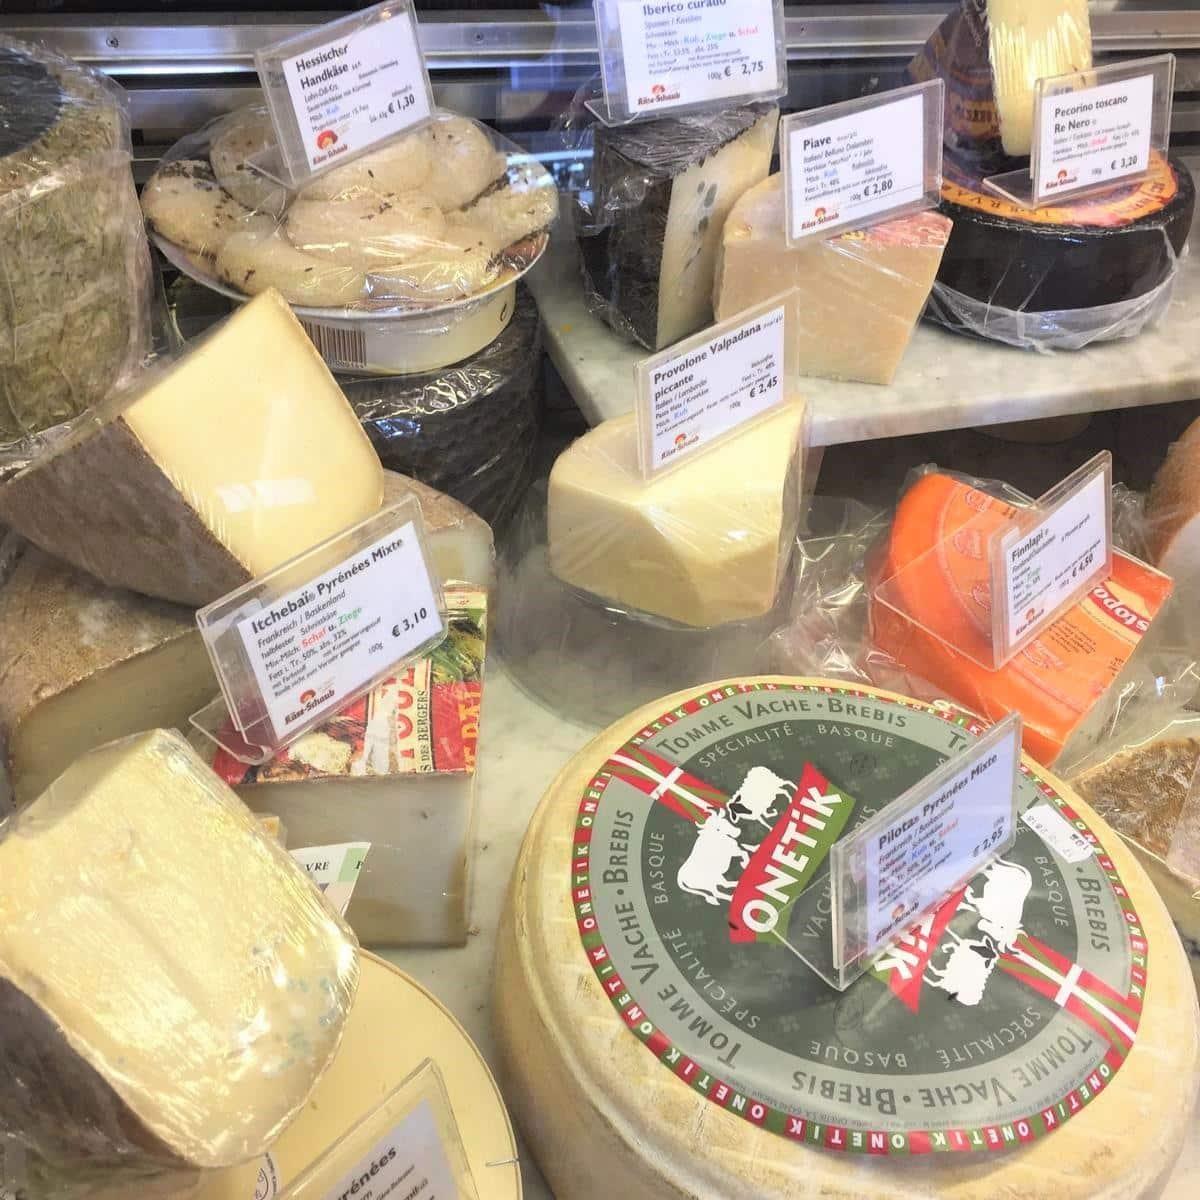 style hannover kaese schaub B2 - Käse-Schaub - Käse voller Tradition